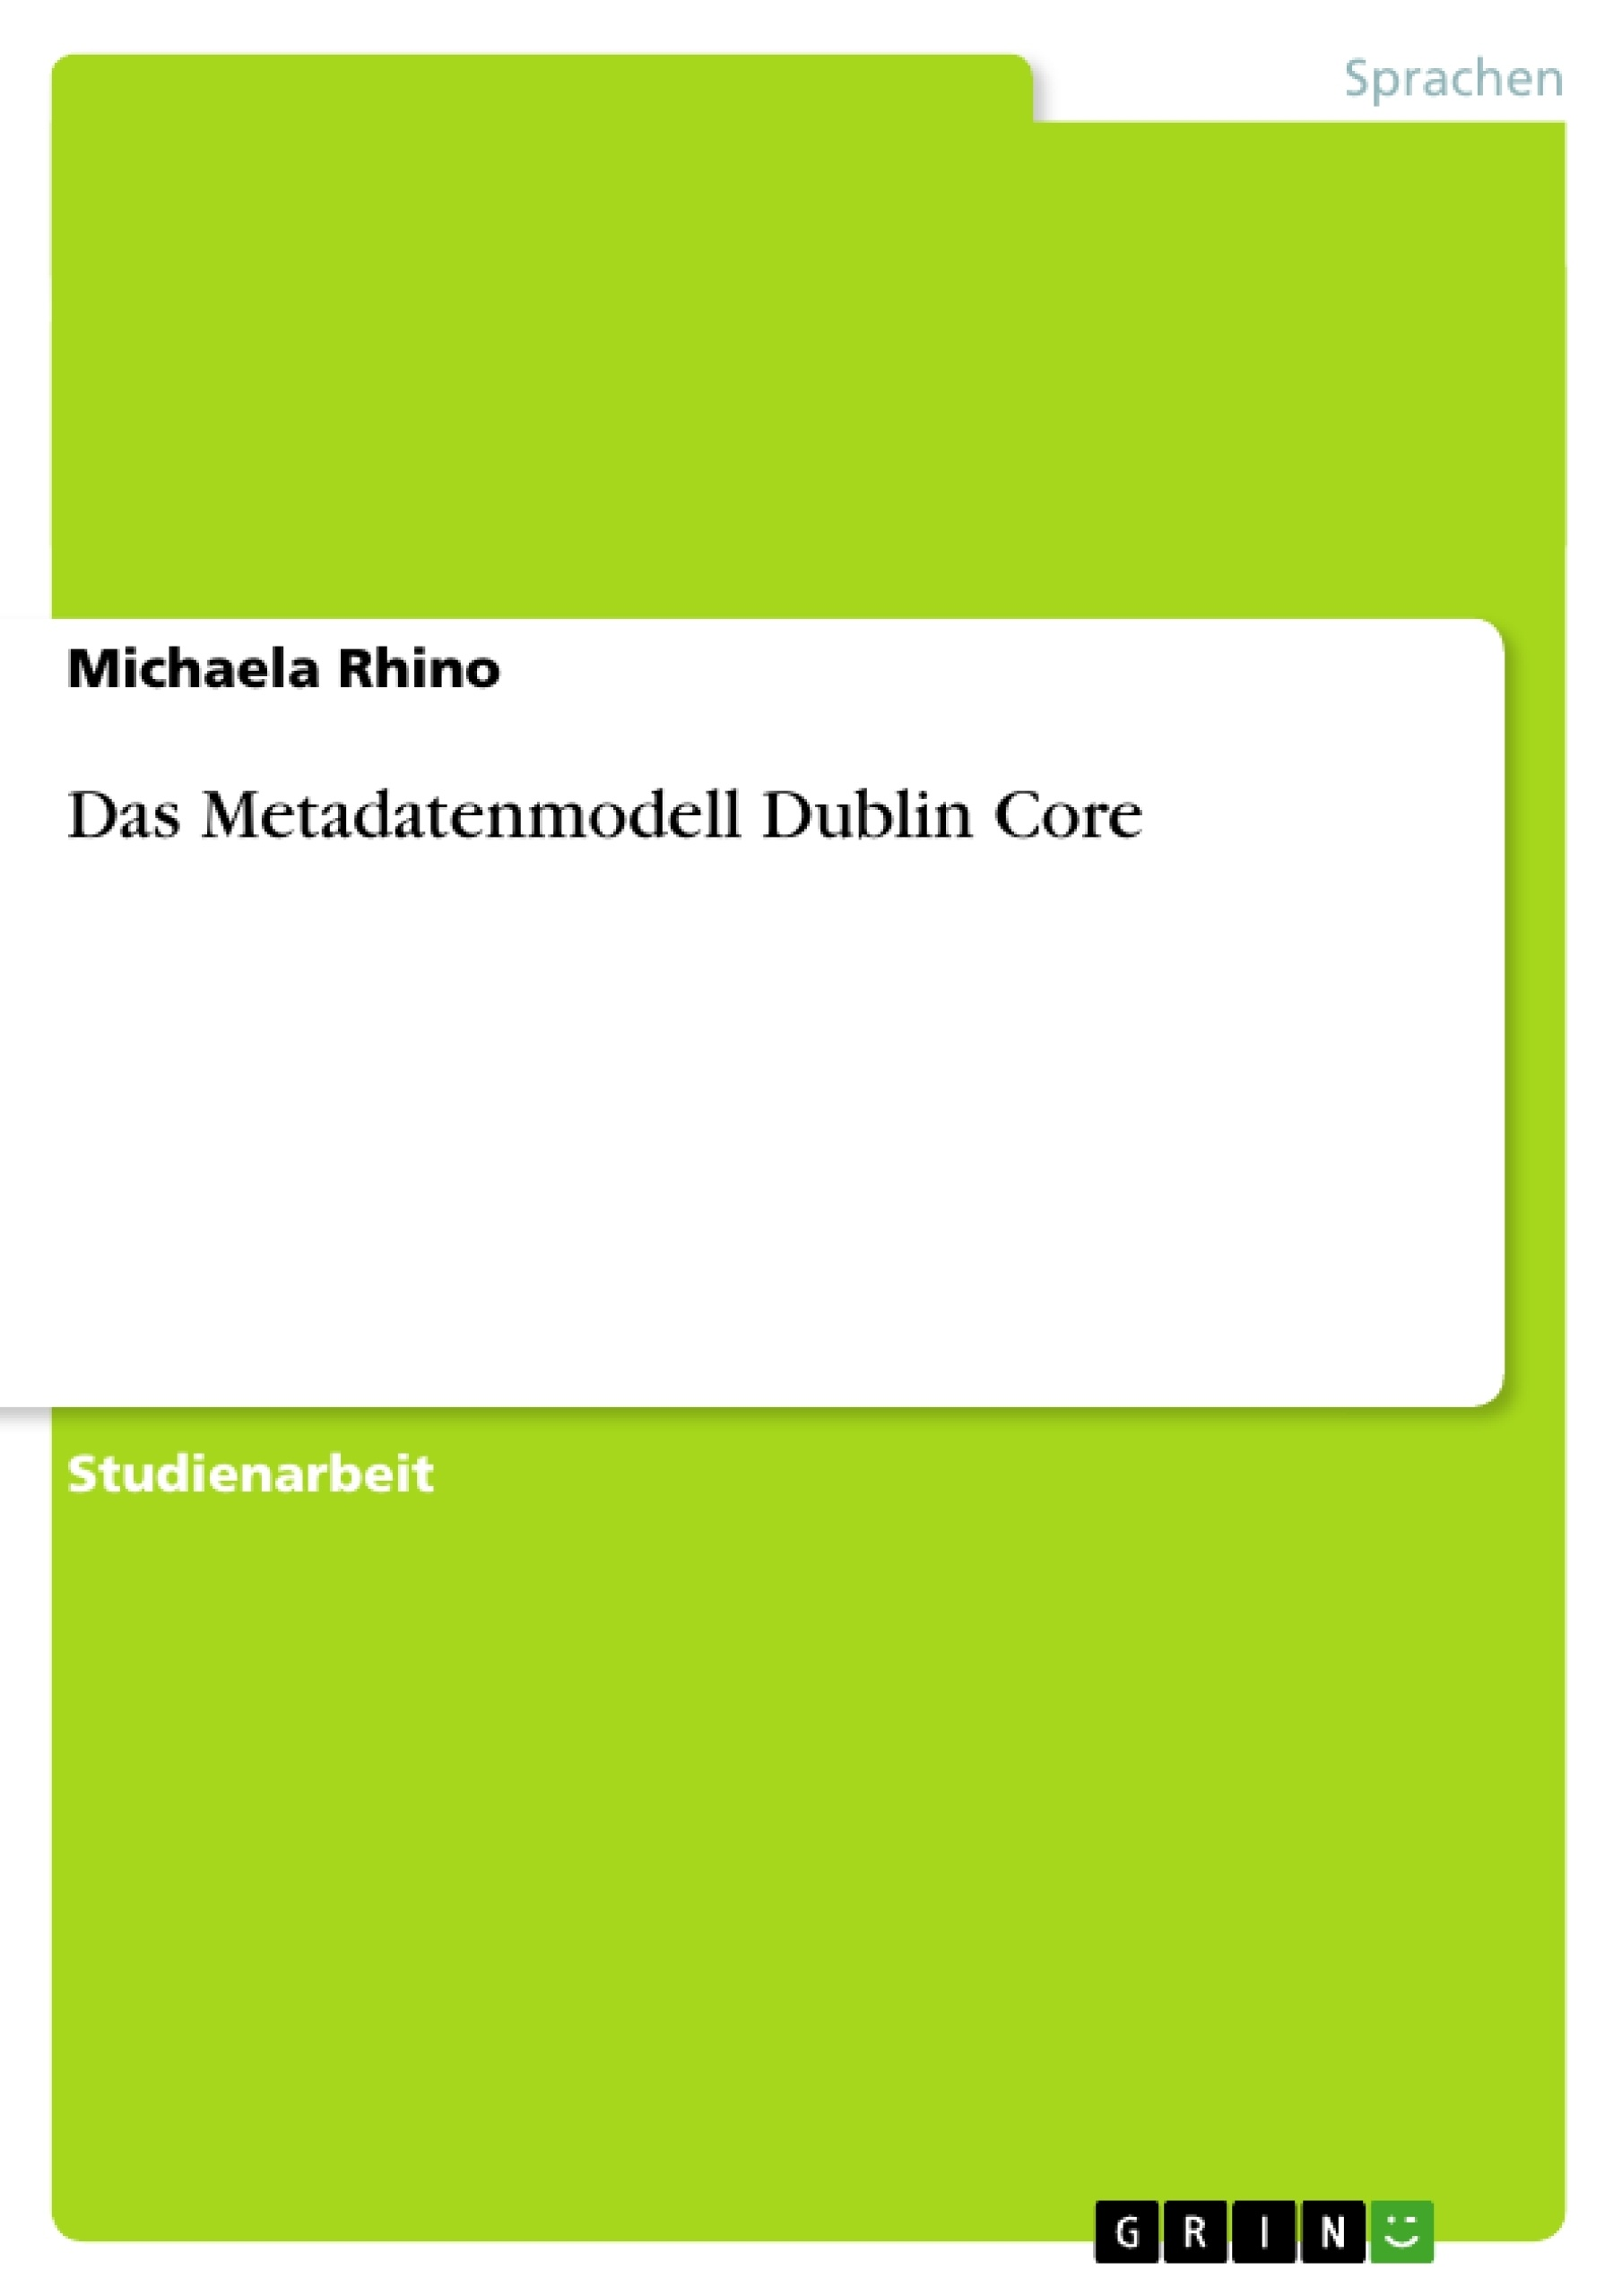 Titel: Das Metadatenmodell Dublin Core